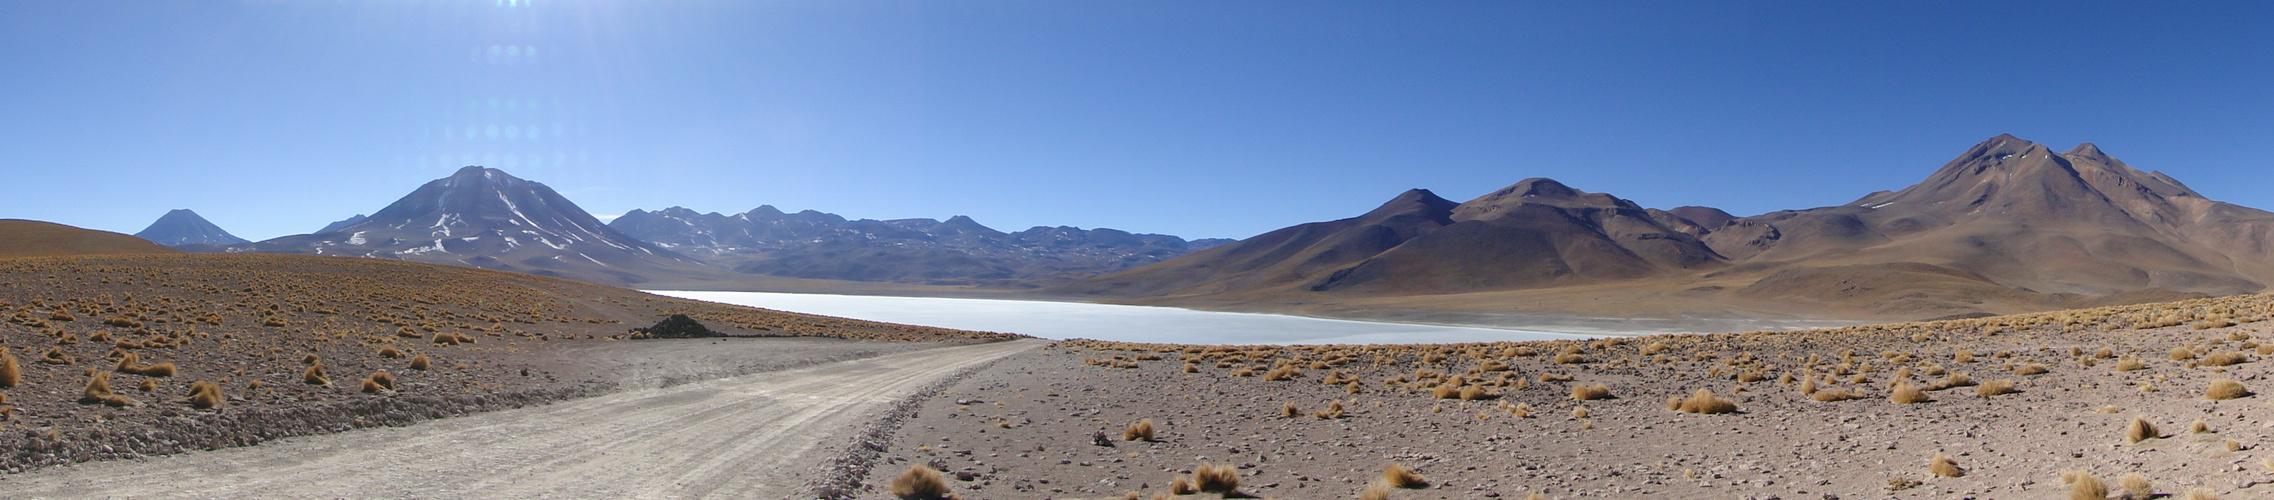 panoramica de laguna miscanti